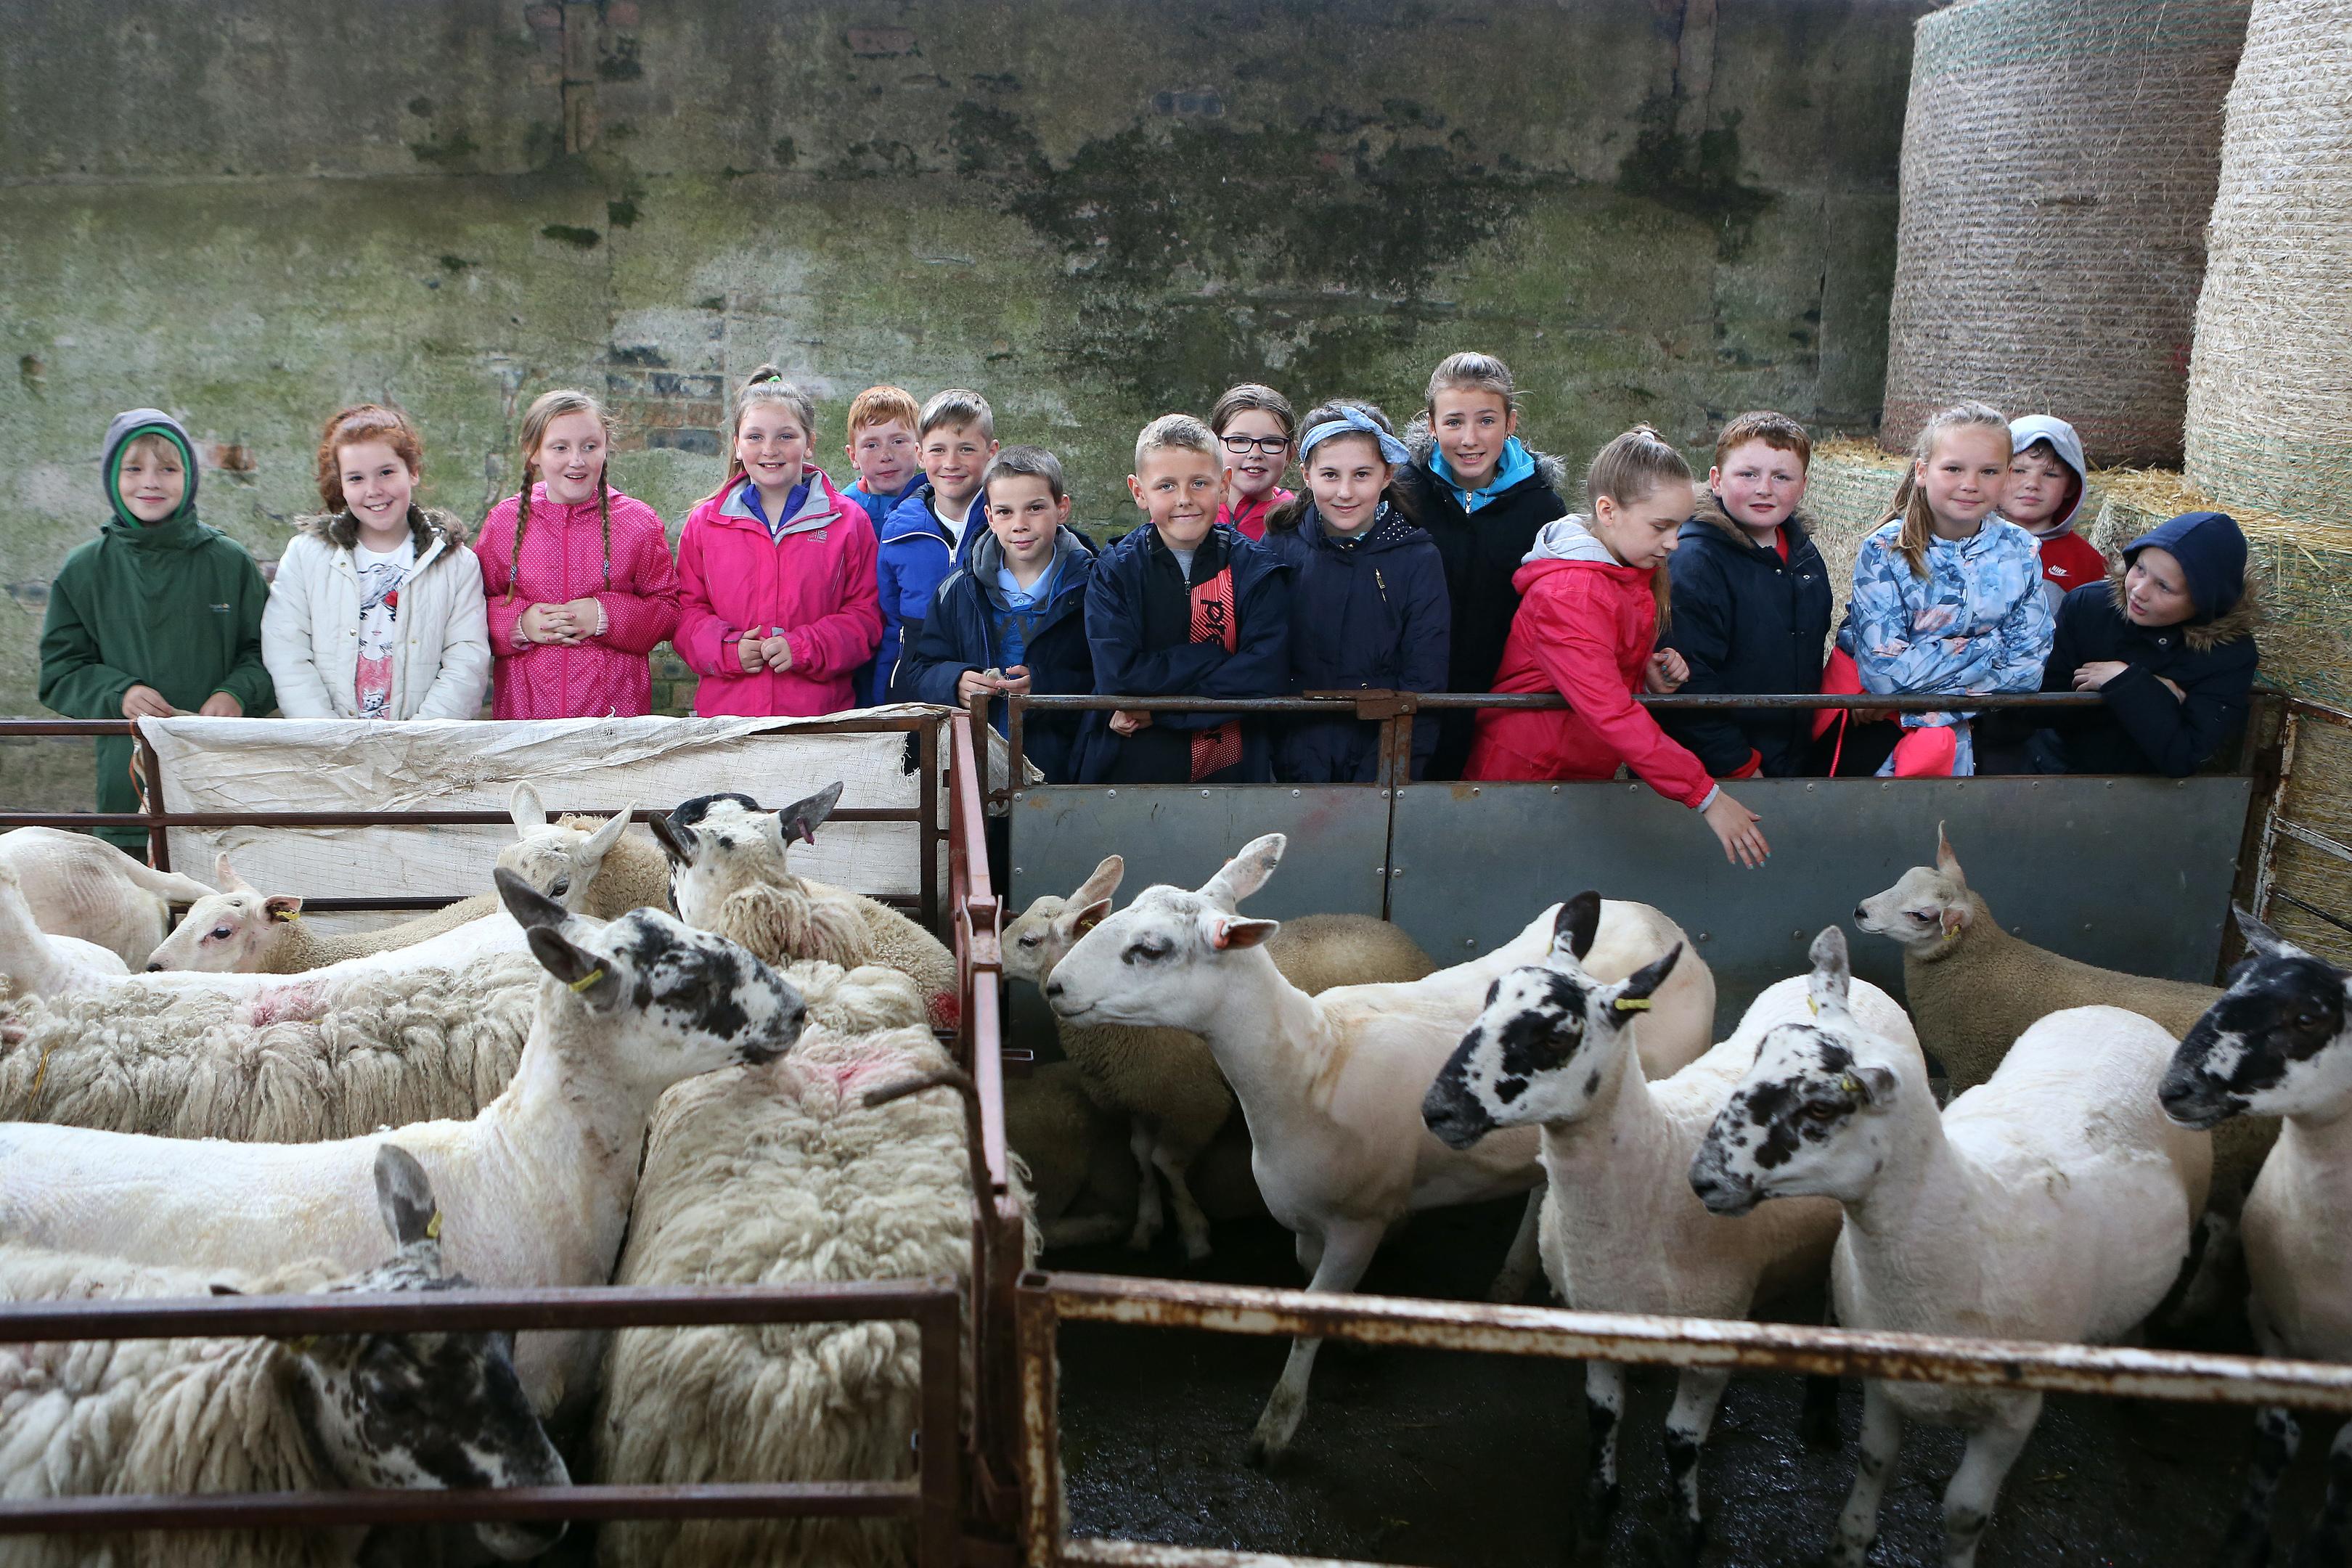 RHET takes 12,000 children to farms each year